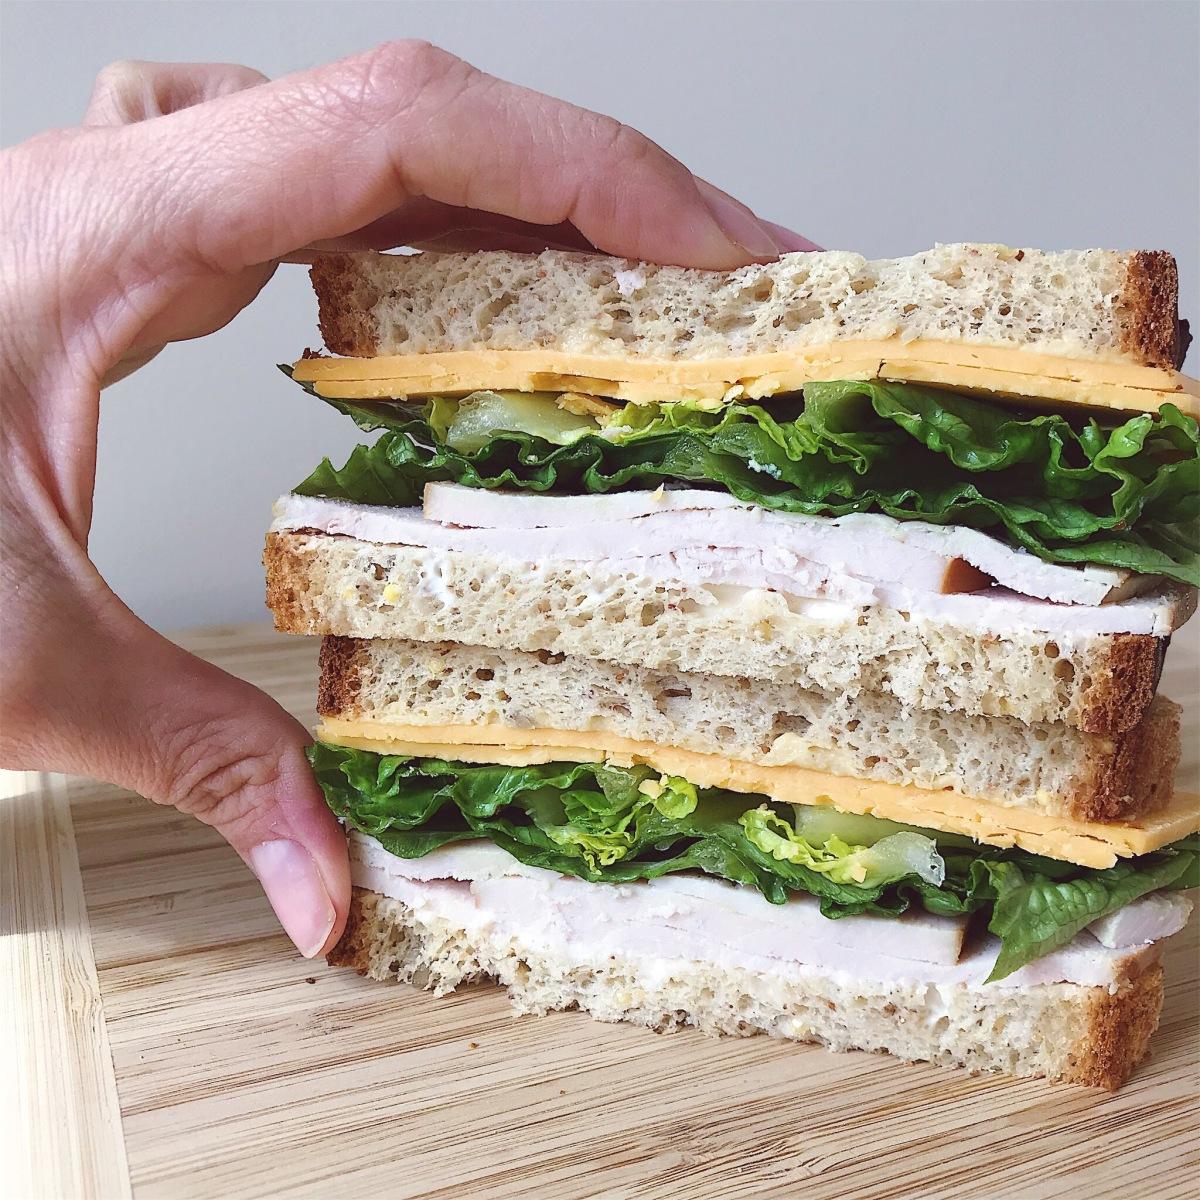 Healthier Sandwiches: 5 Simple Steps